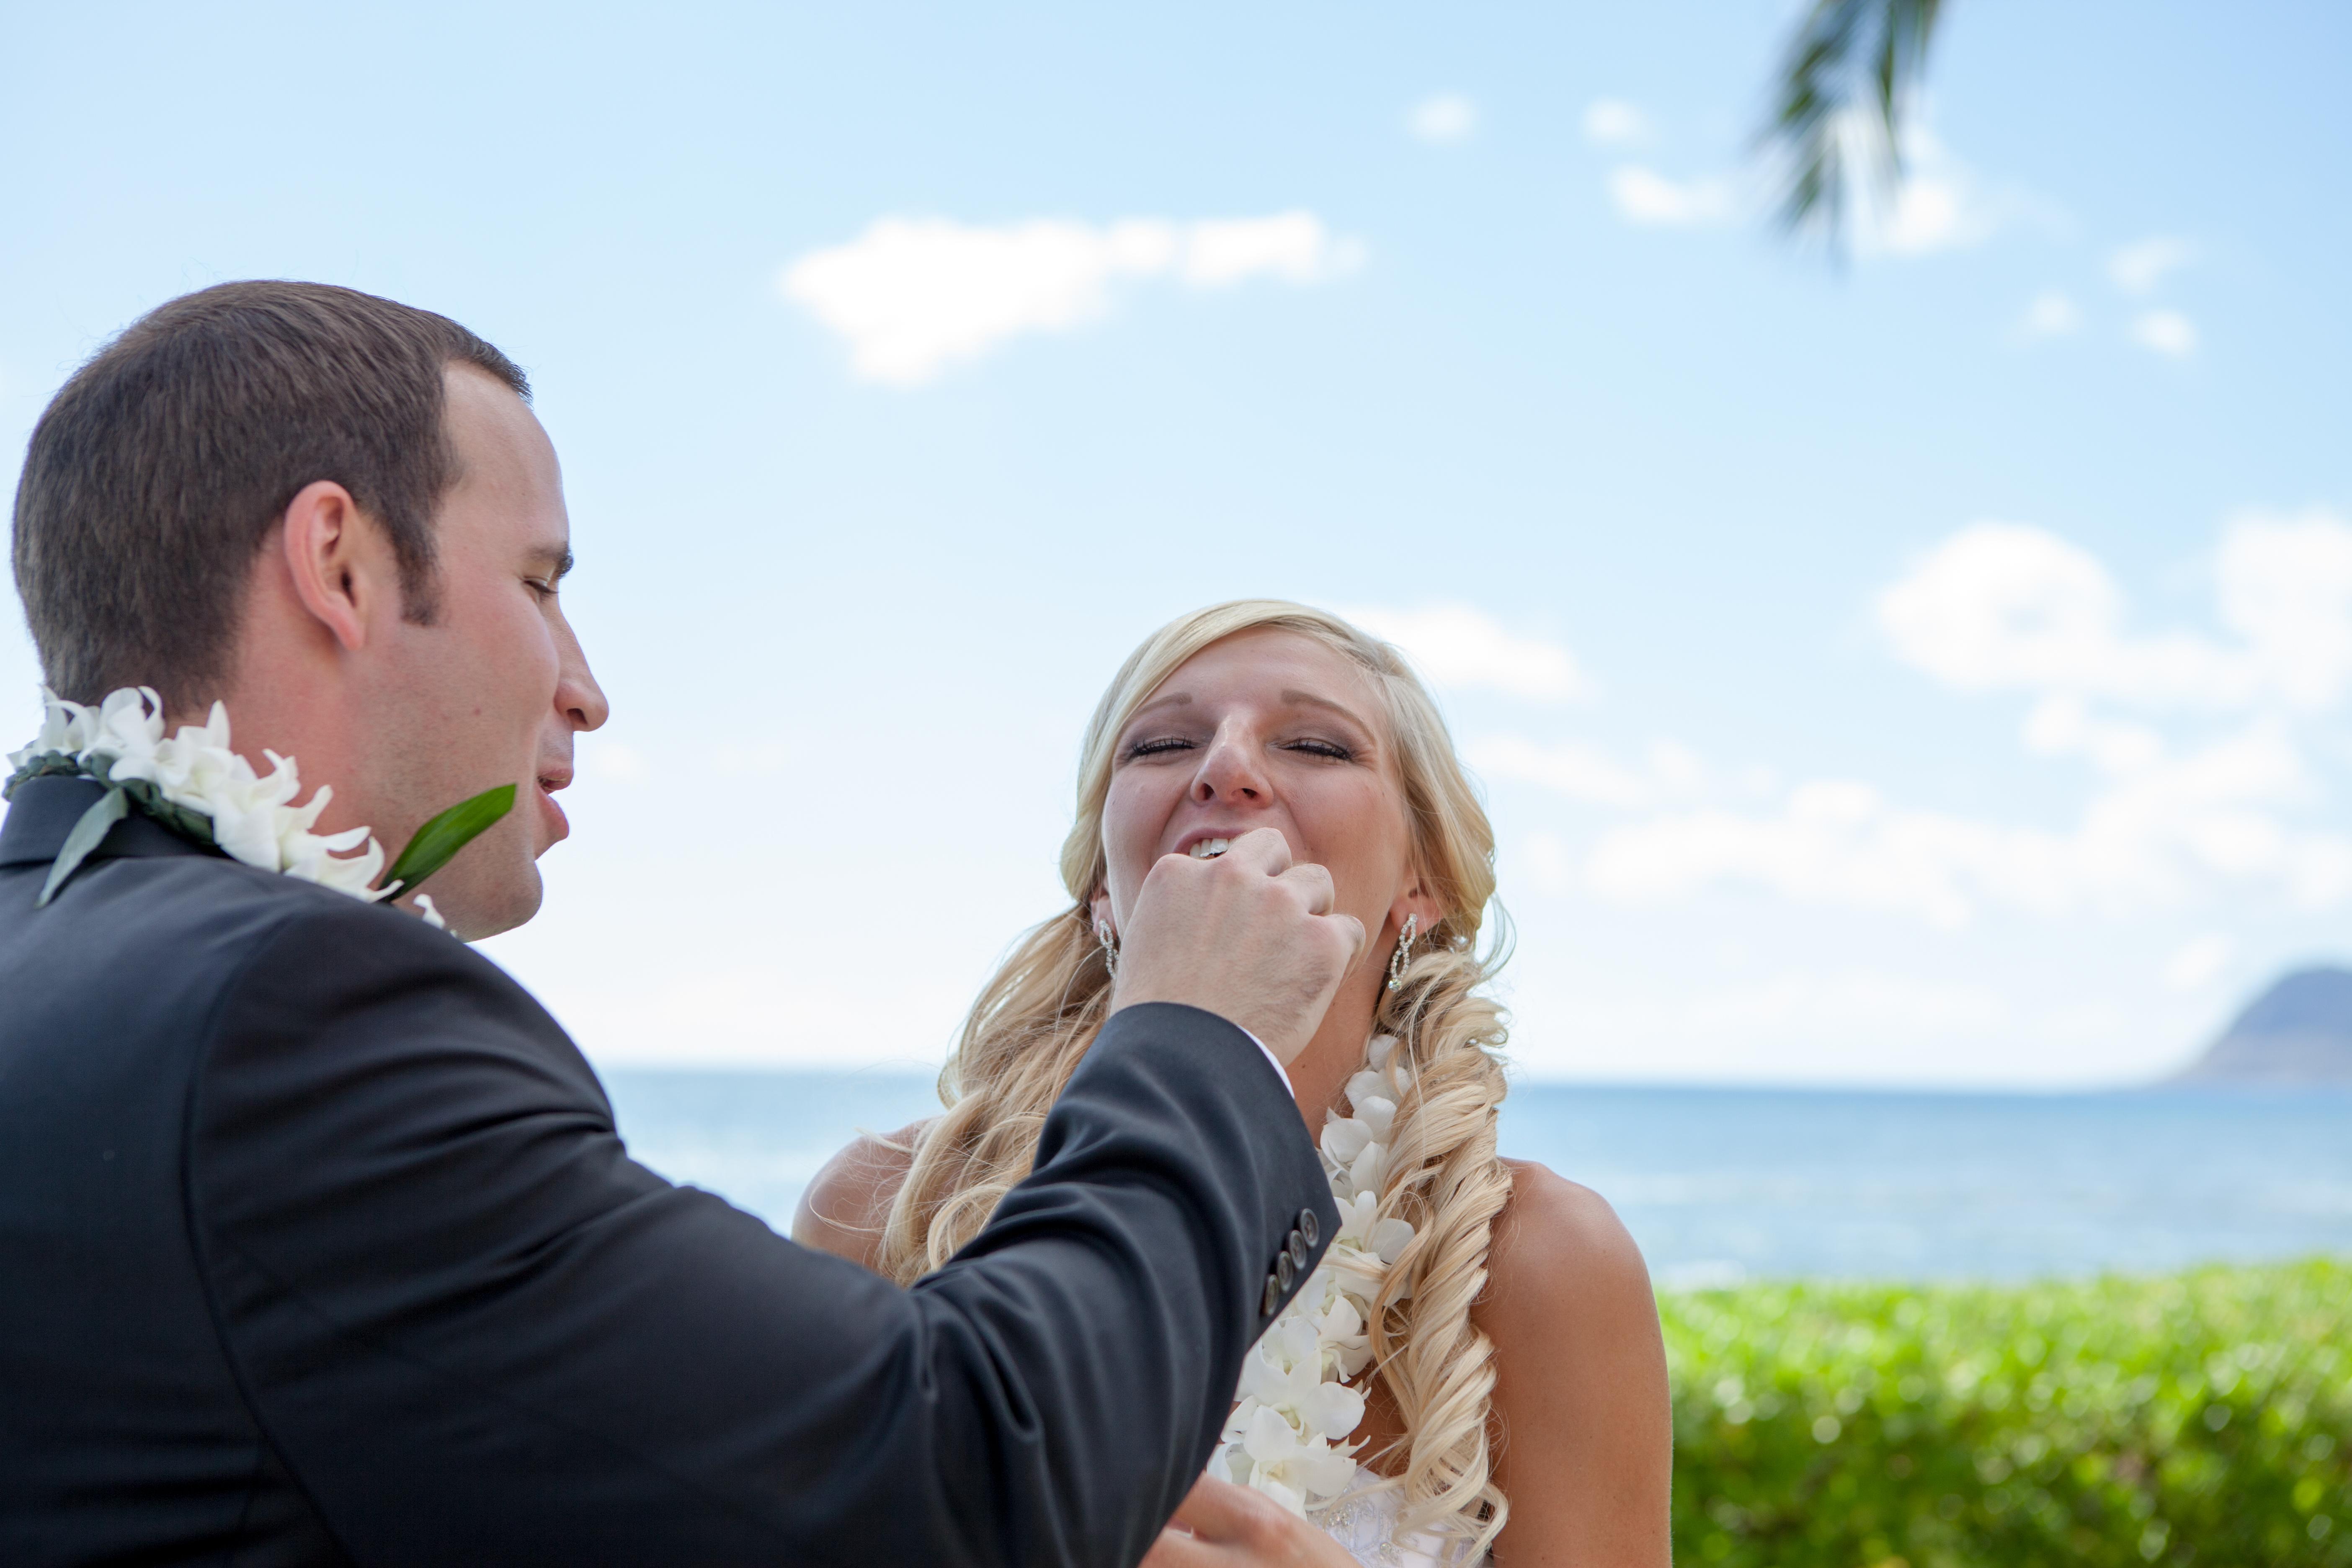 Wedding ceremony at paradise cove 10